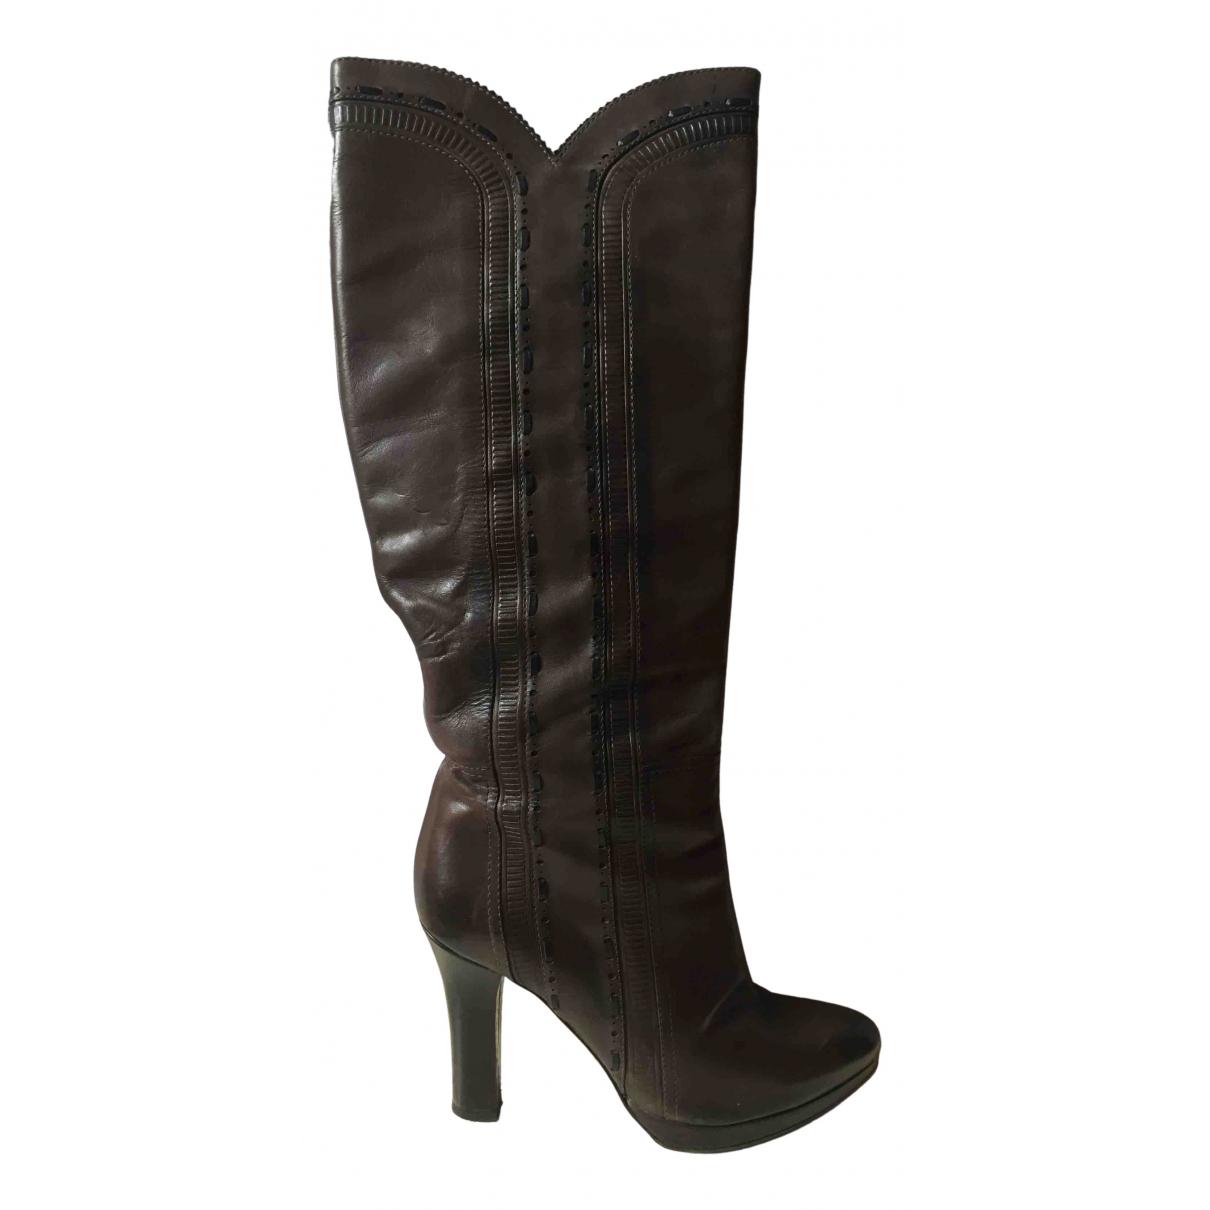 Bottega Veneta N Brown Leather Boots for Women 37 IT